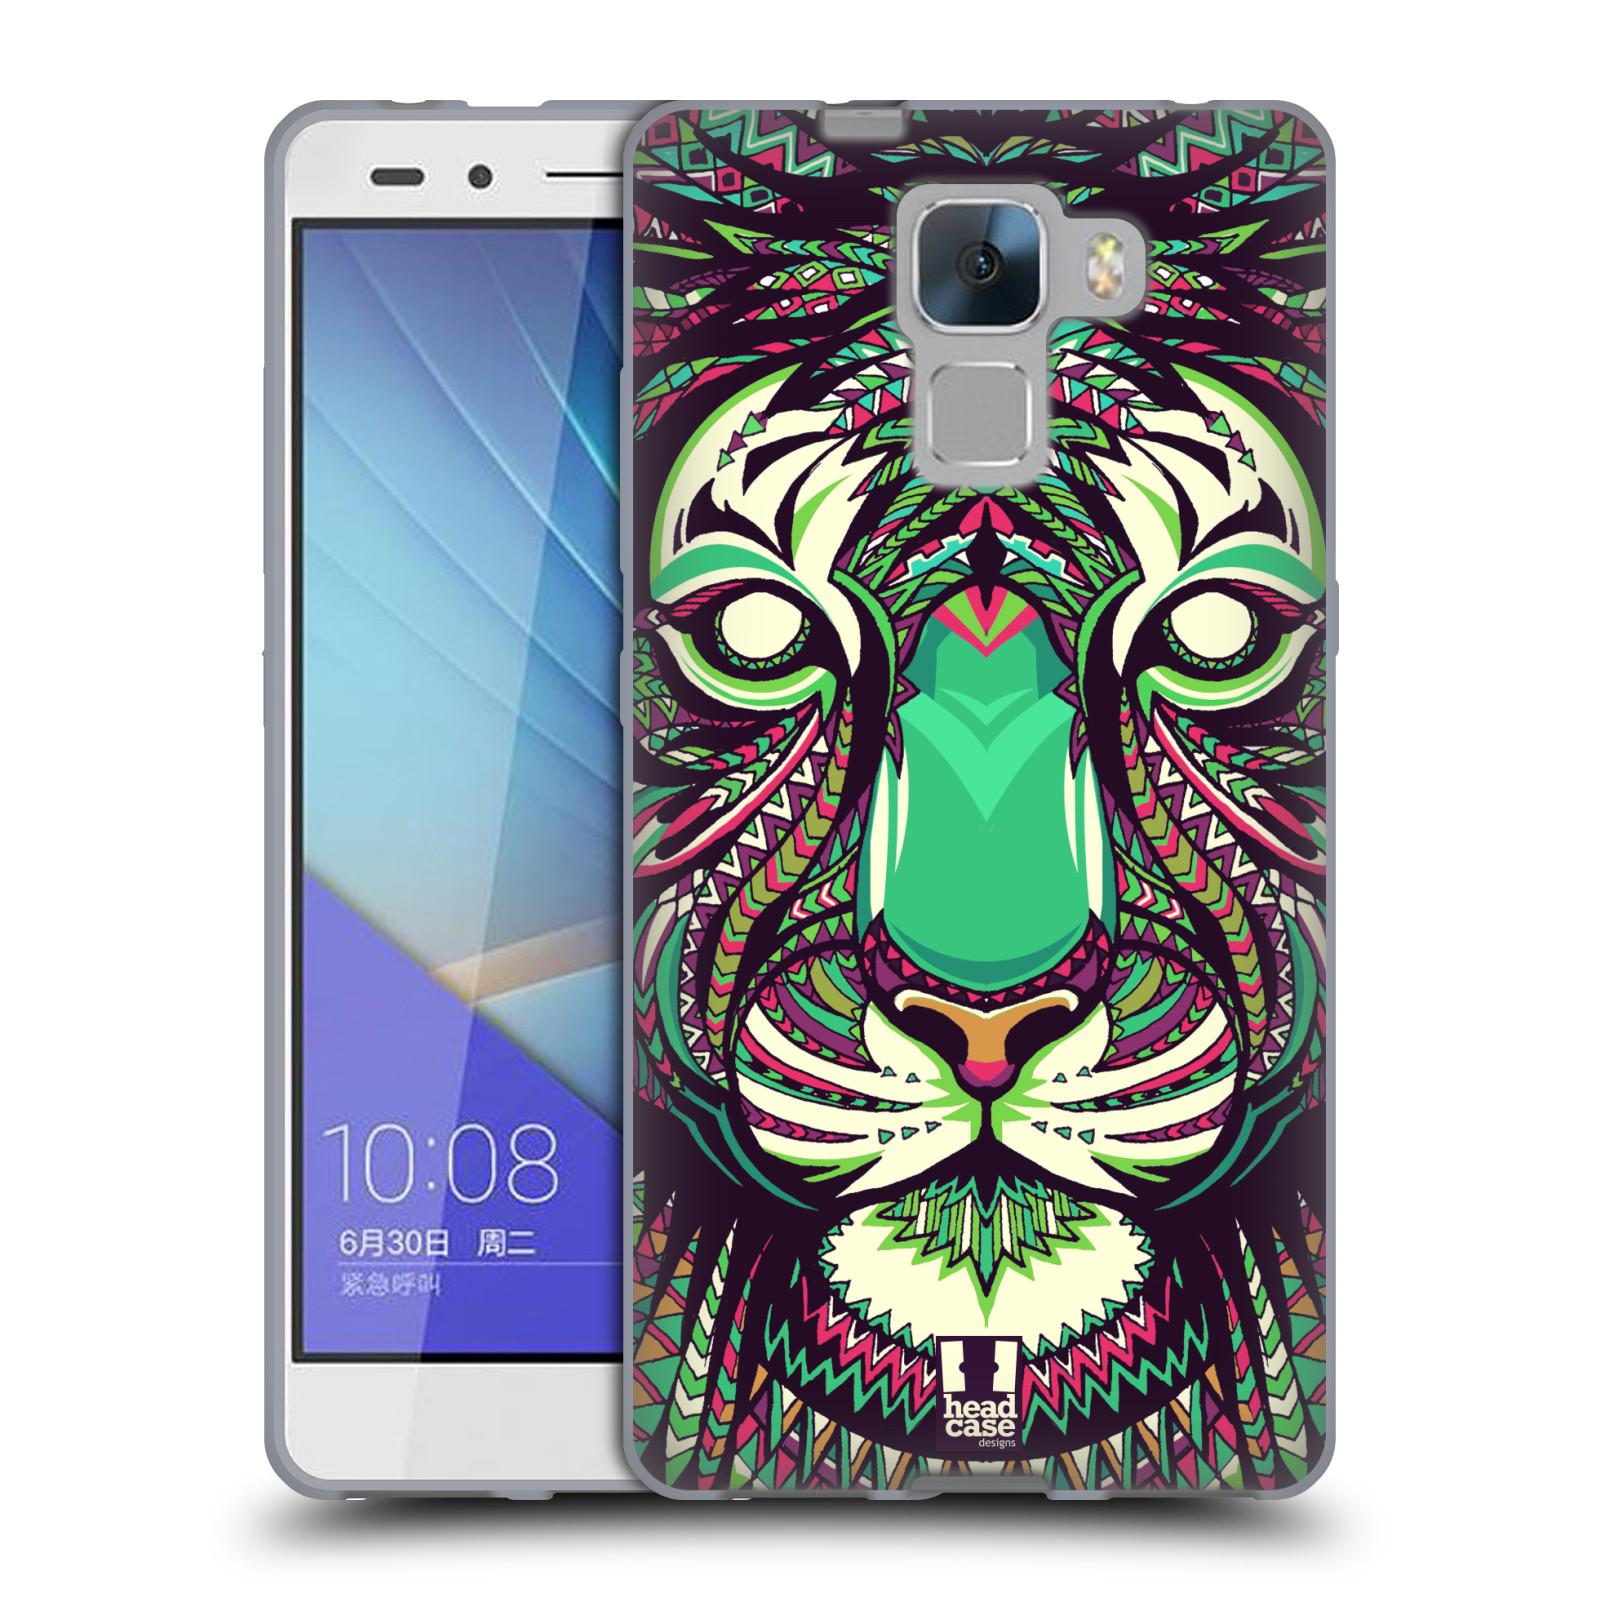 Silikonové pouzdro na mobil Honor 7 HEAD CASE AZTEC TYGR